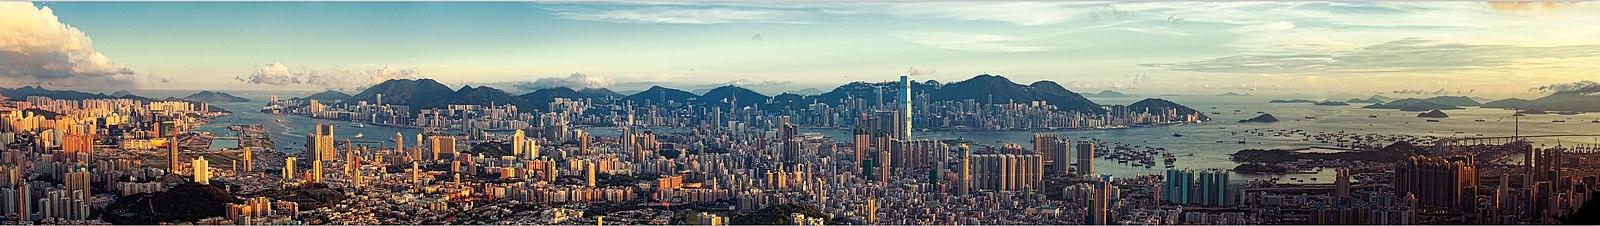 Hongkong, en.wikipedia.org